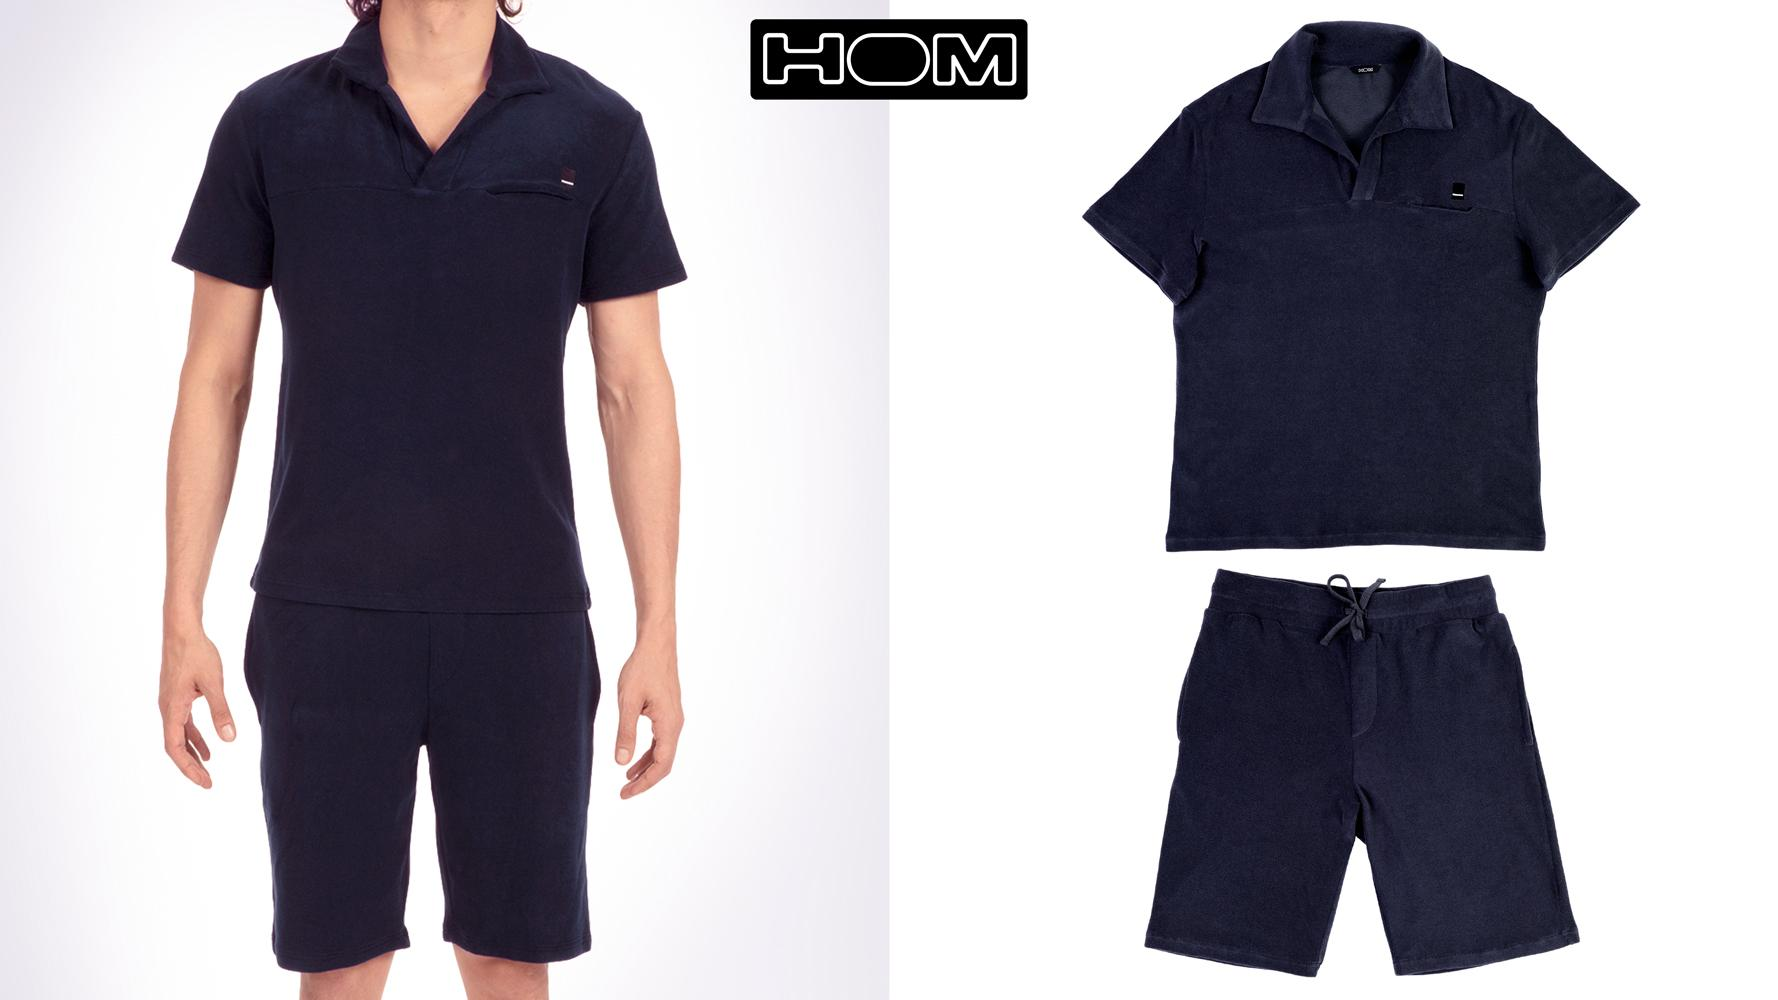 Hom Marlon Short Sleepwear